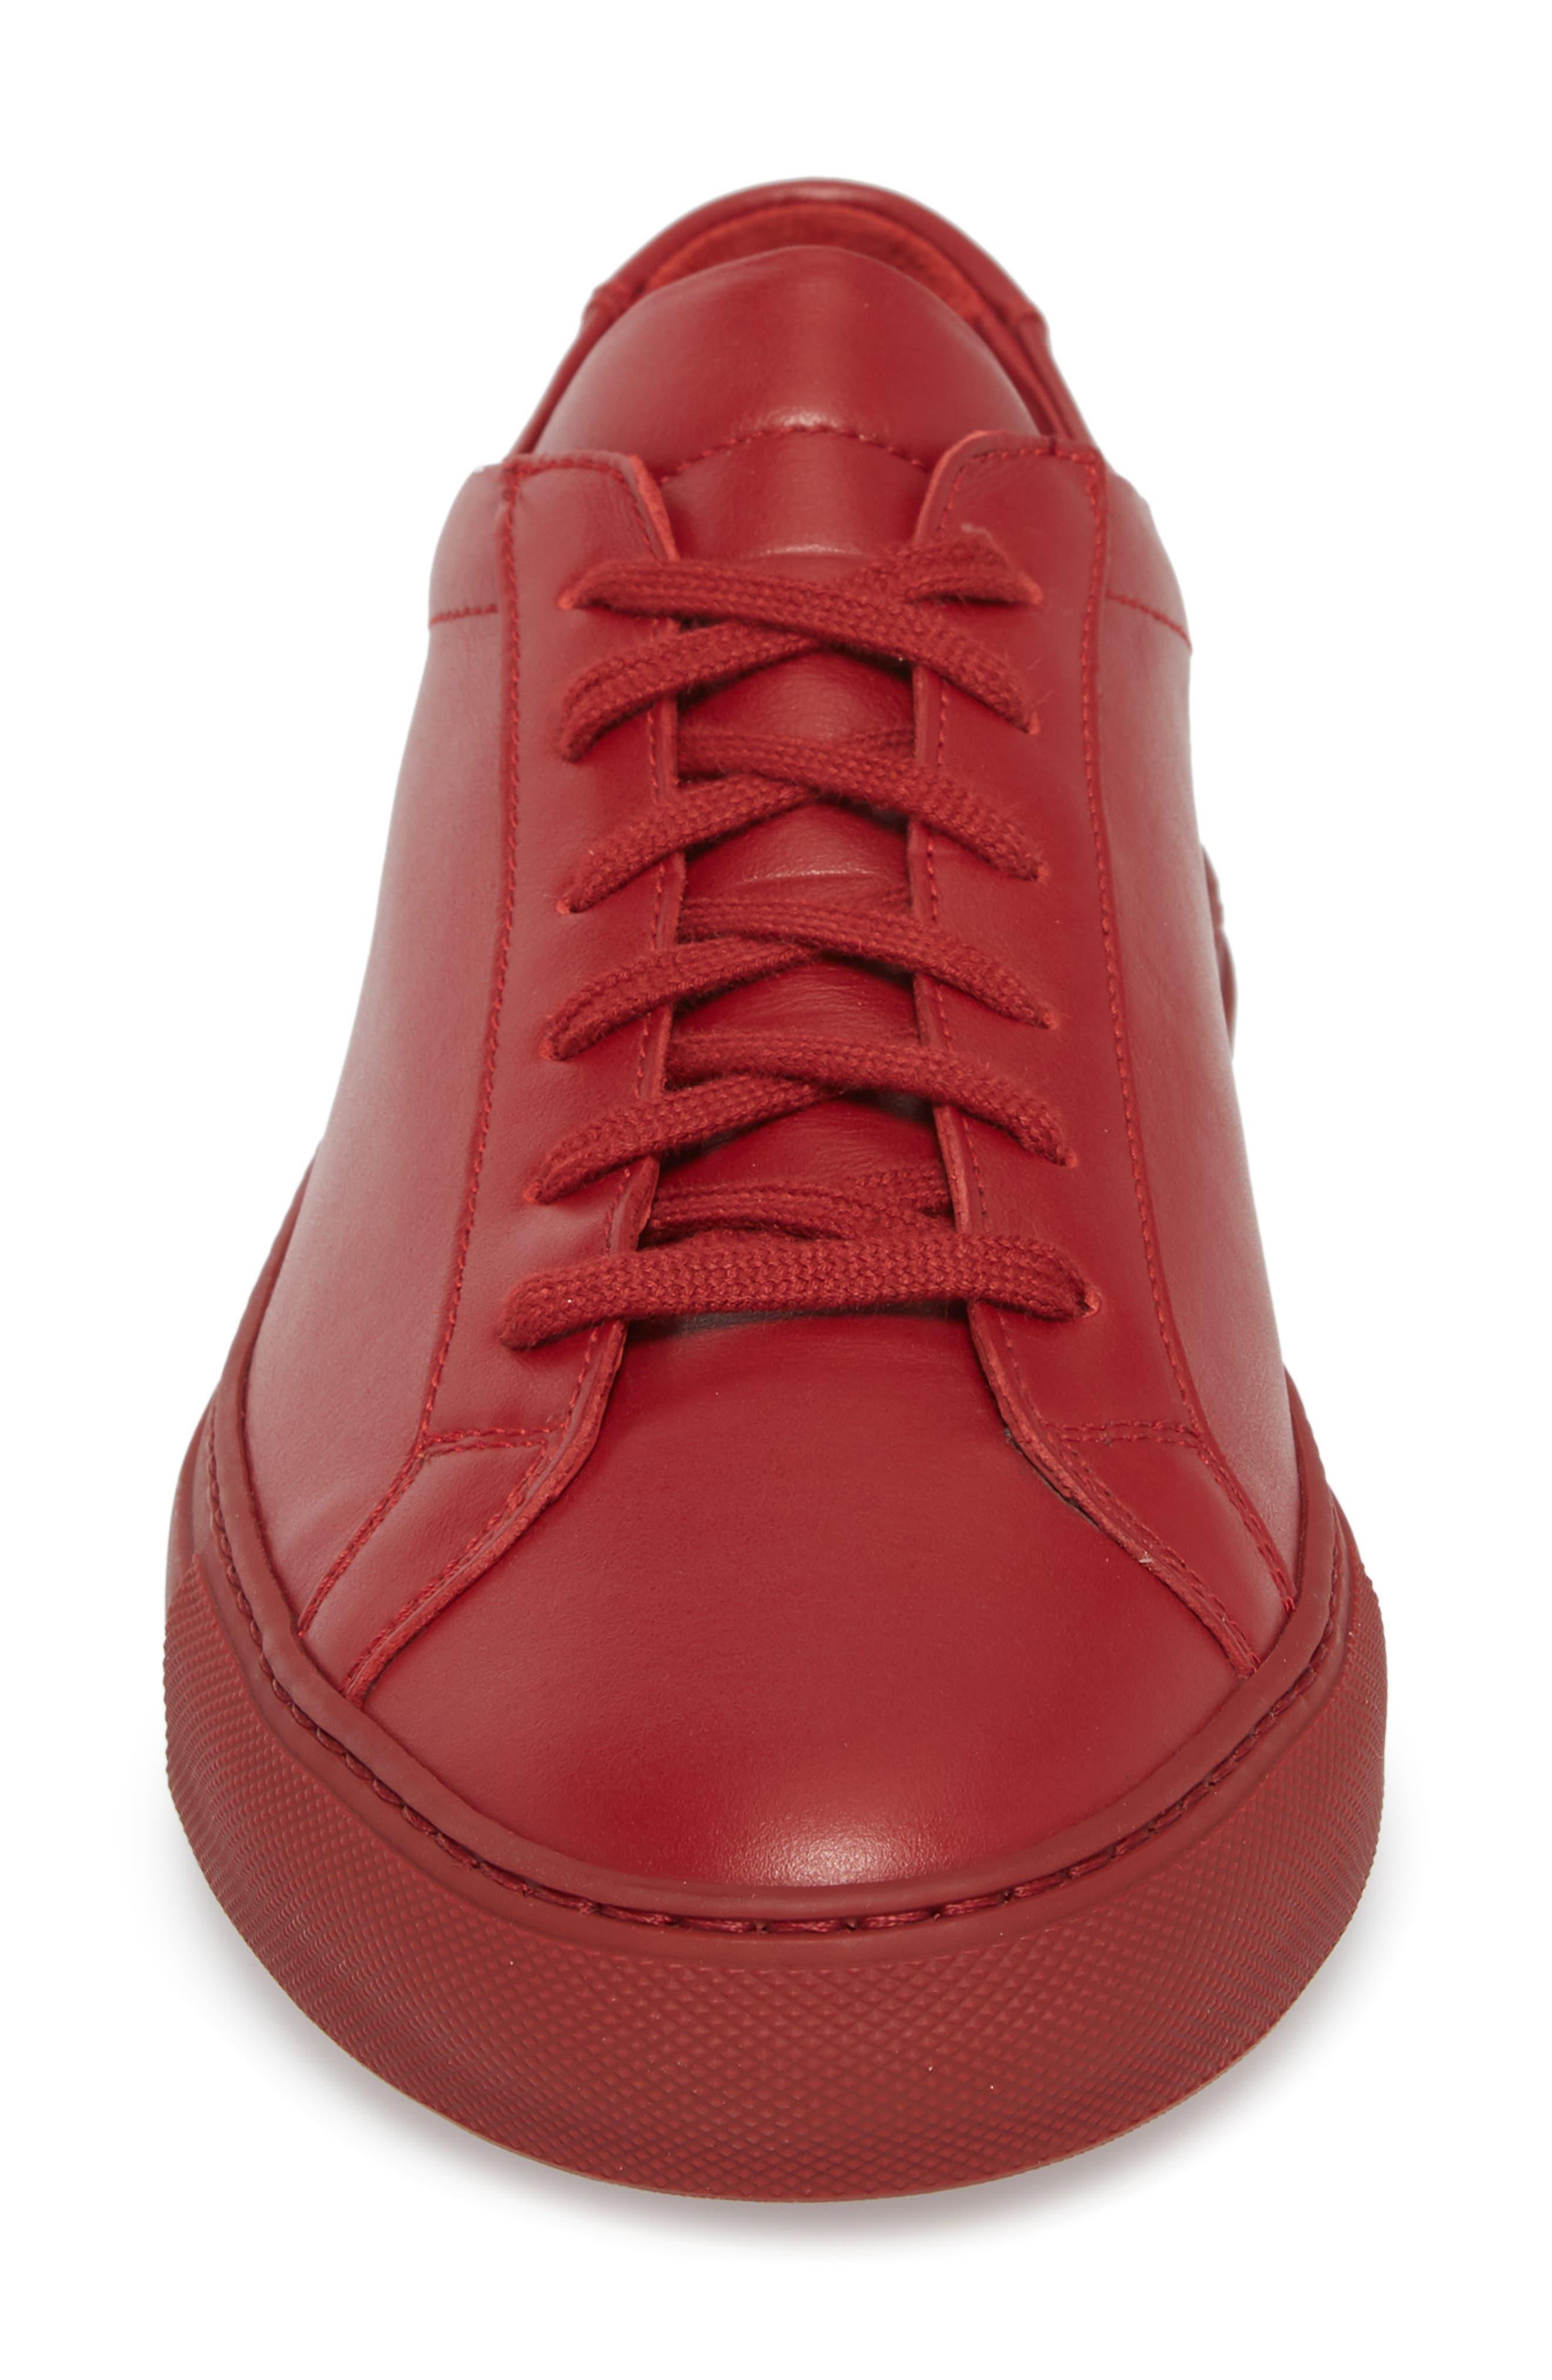 Original Achilles Sneaker,                             Alternate thumbnail 4, color,                             RED LEATHER